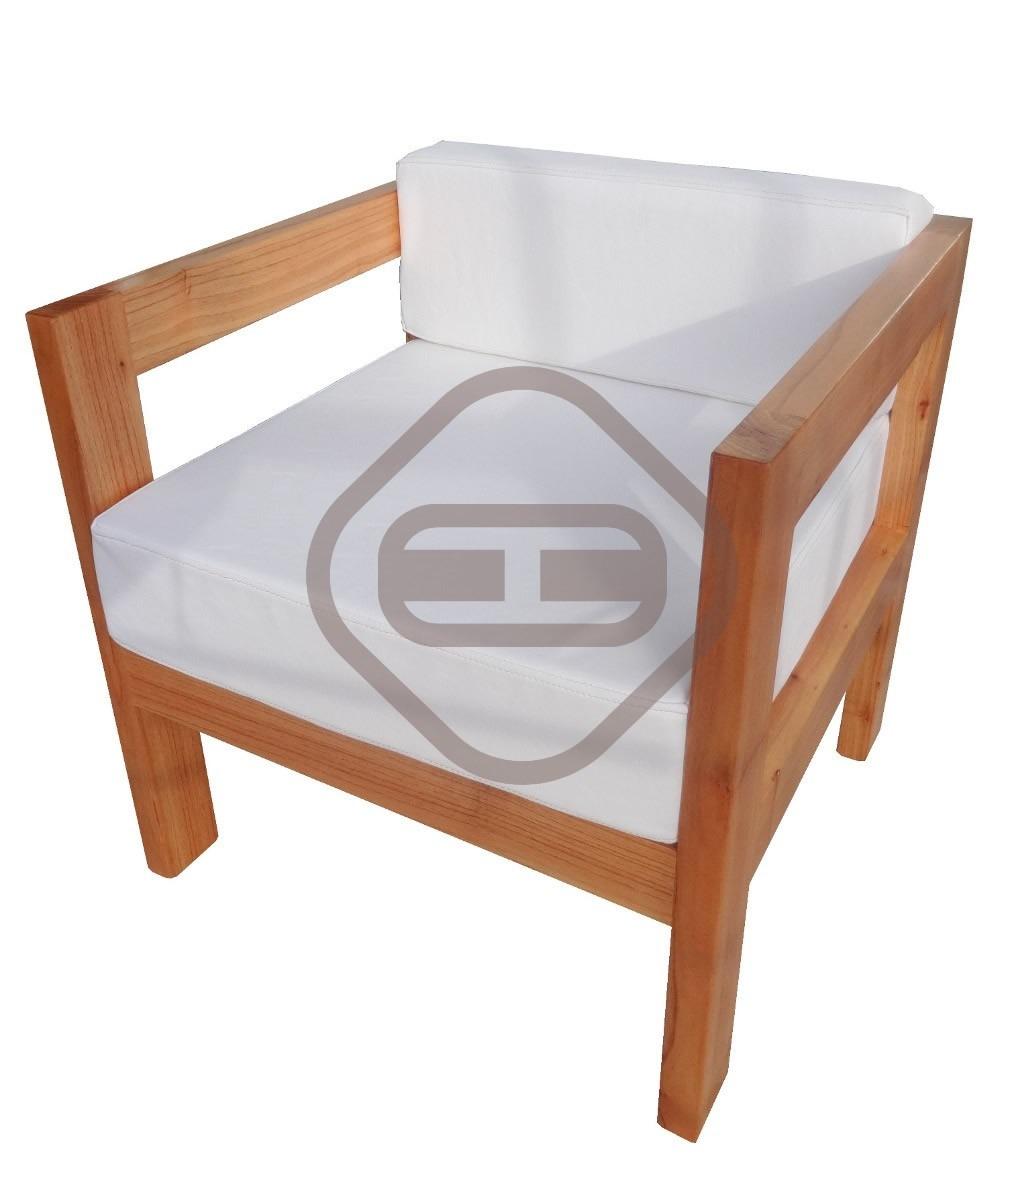 Juego sillones mesa jard n balcon terraza madera for Mesa exterior terraza